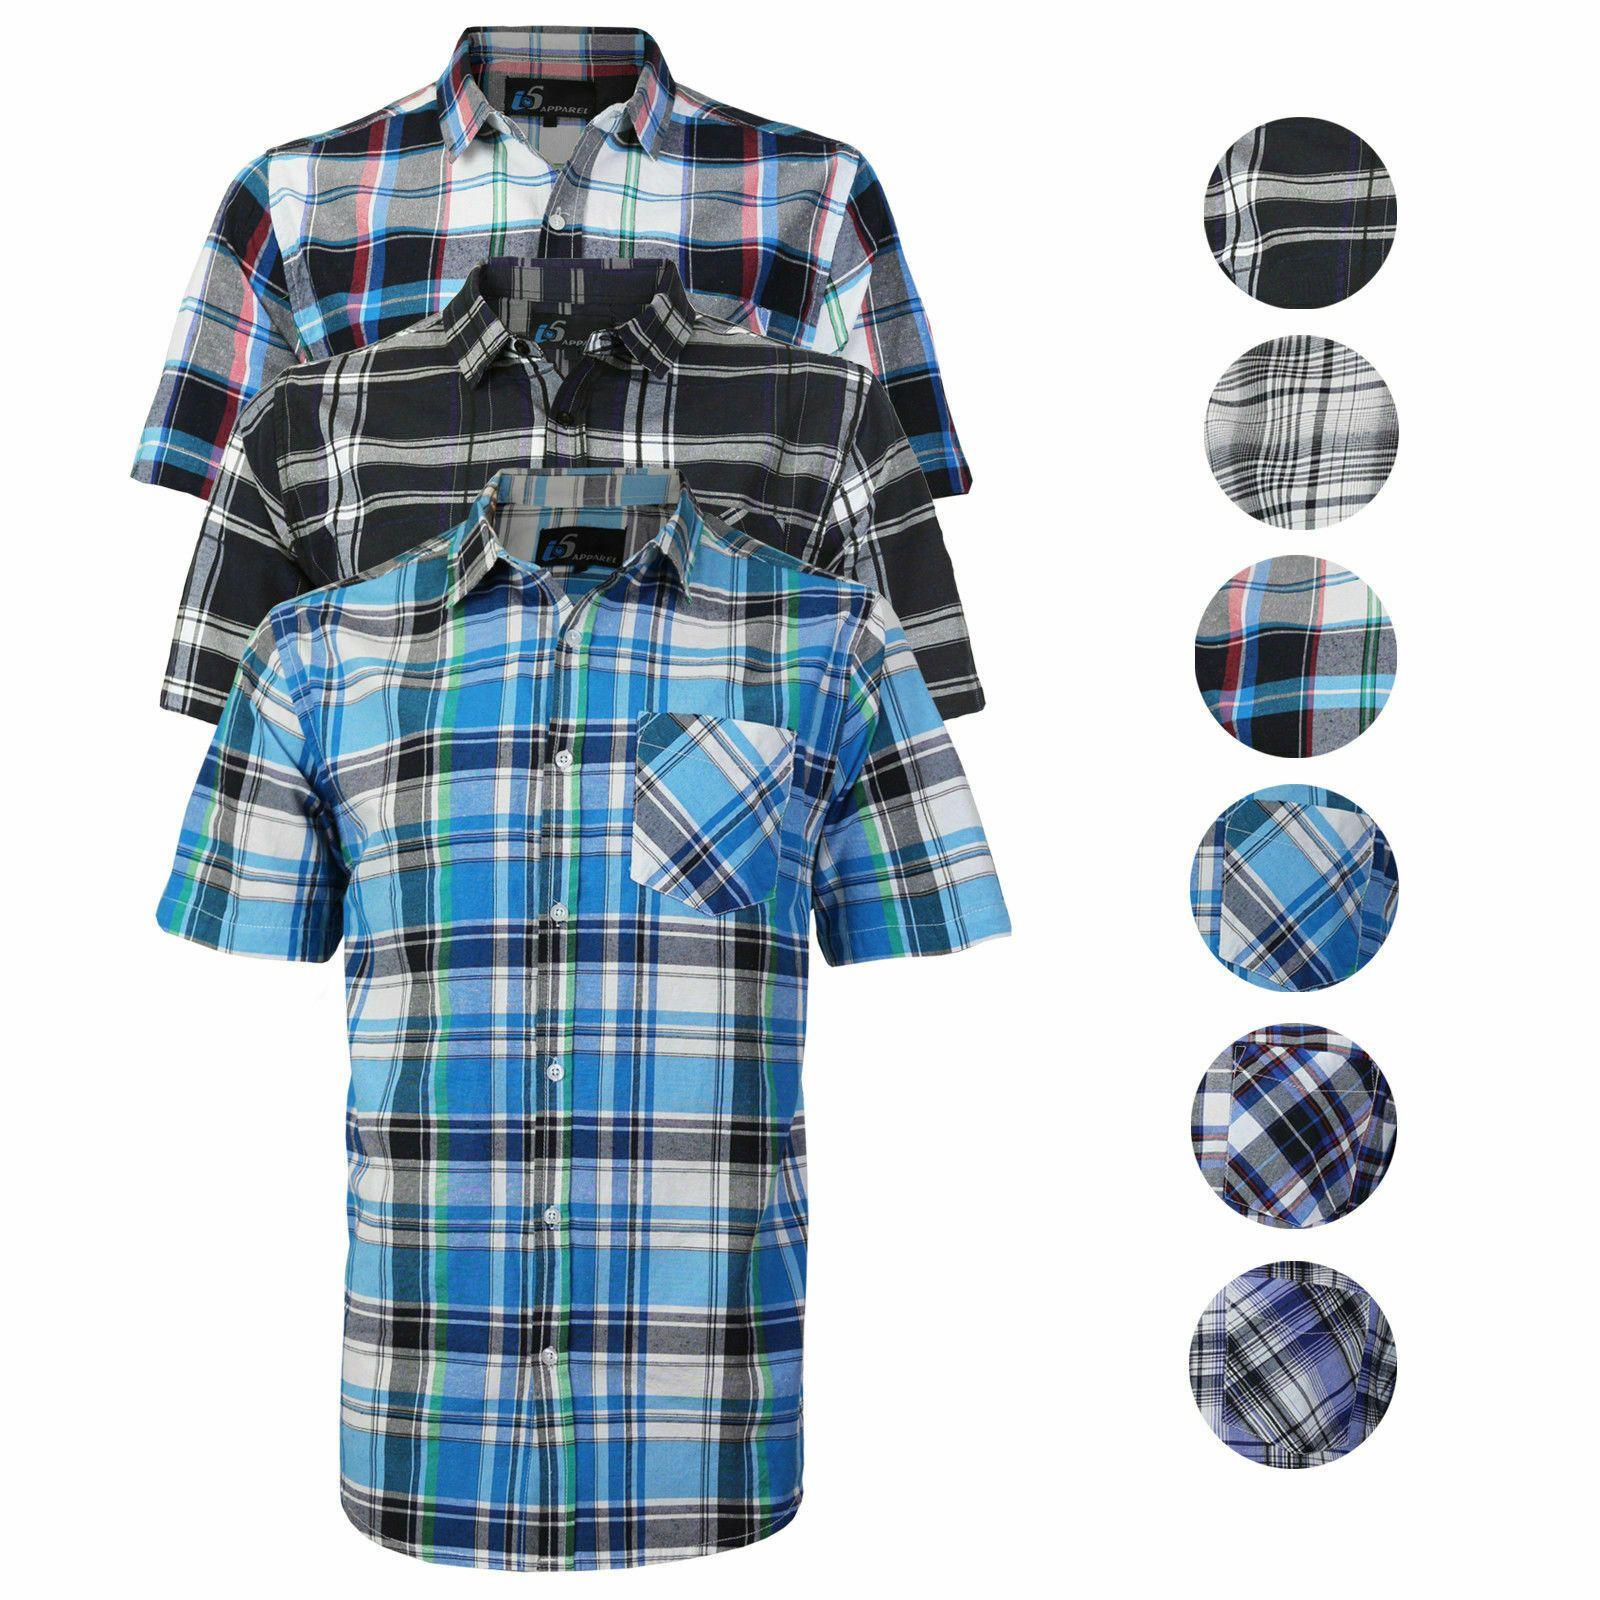 Mens plaid checkered button down casual short sleeve